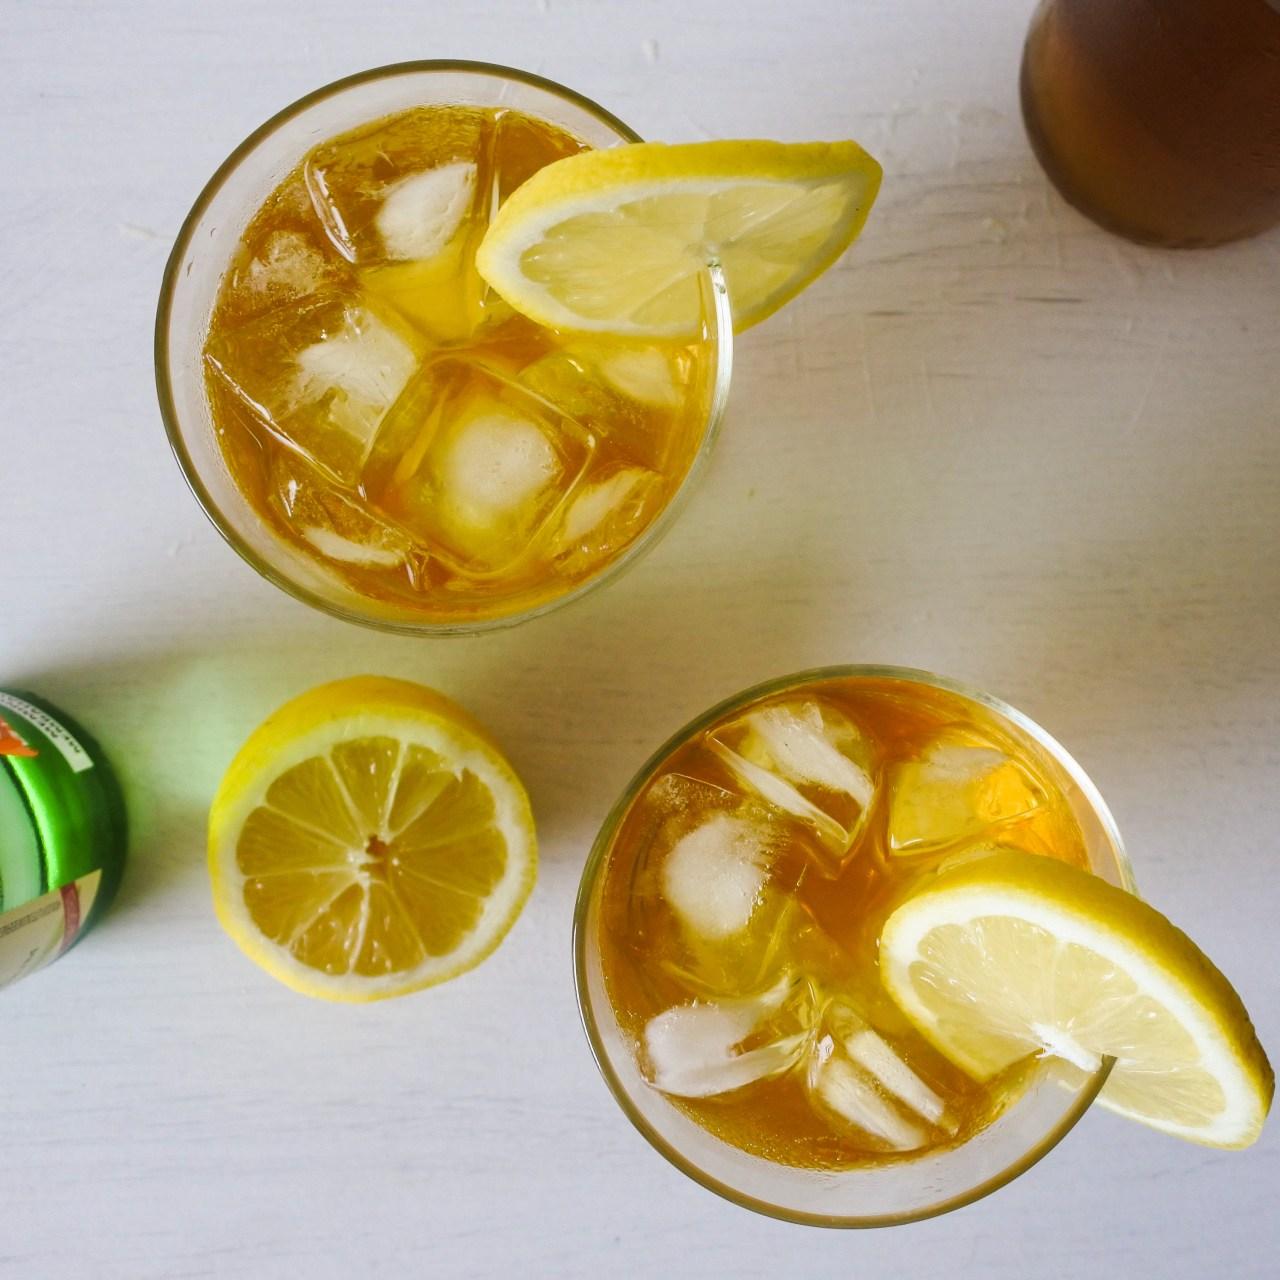 Korean Iced Tea cocktails with lemon slices